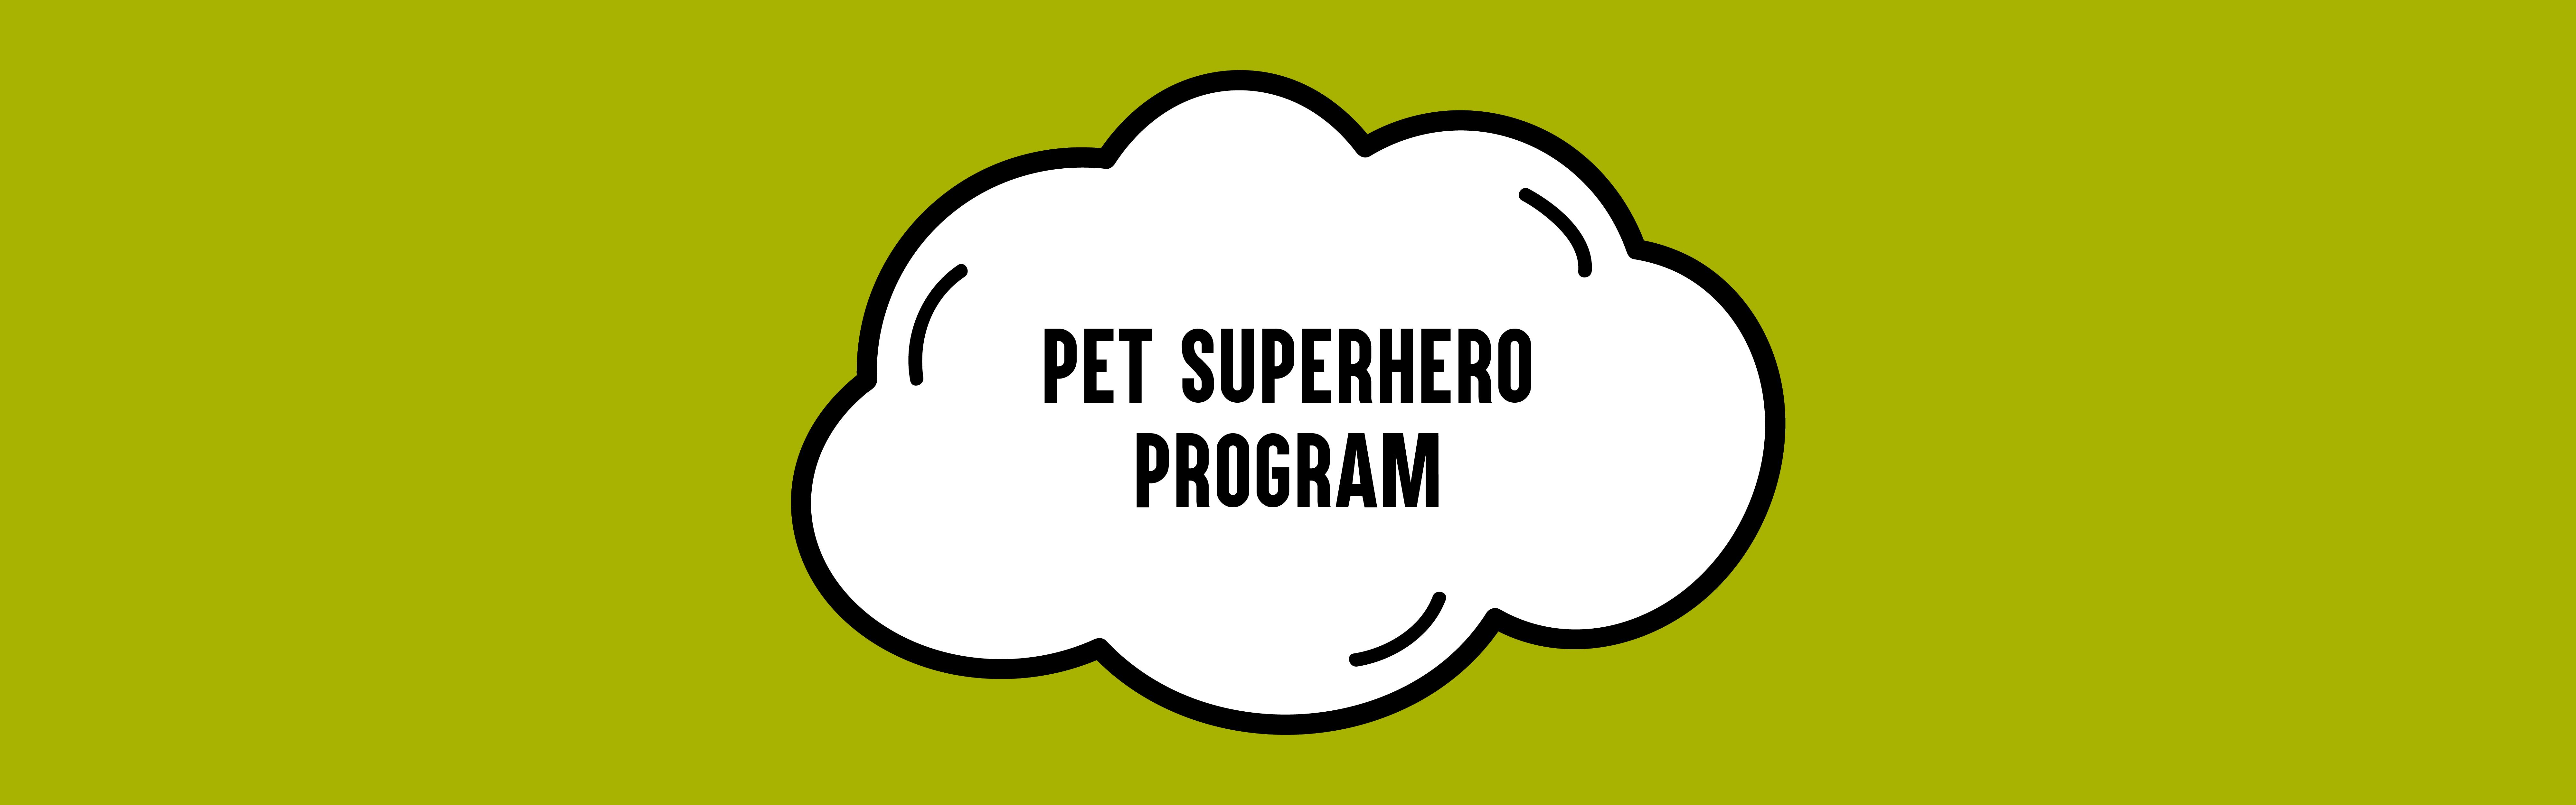 Pet Superhero program banner